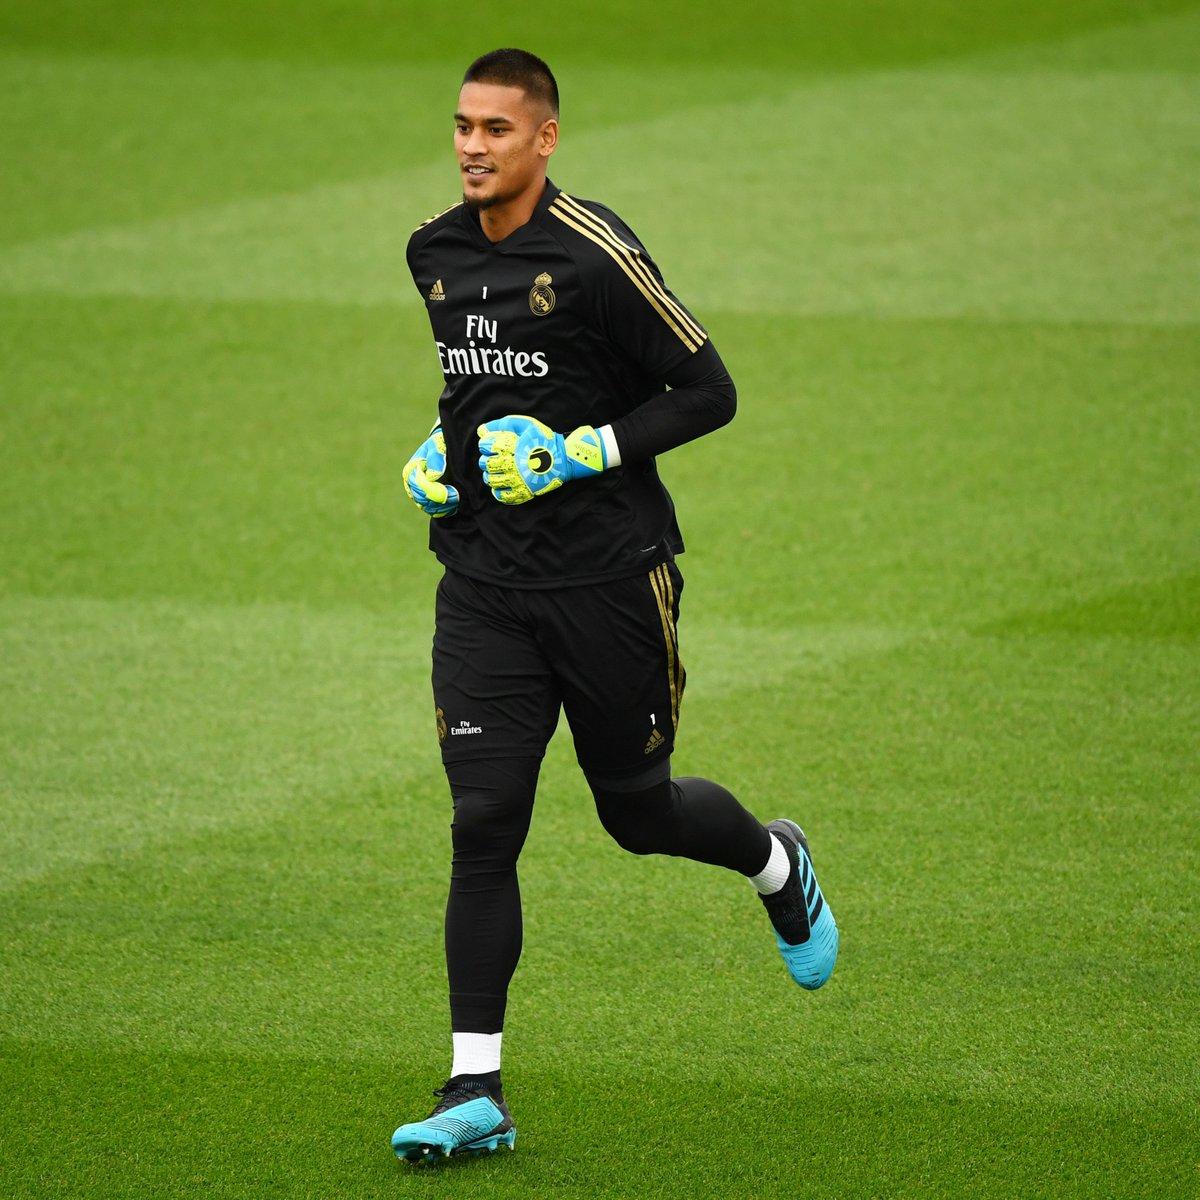 ⚪️ New goalkeeper at Real Madrid... 🙌 Alphonse Areola #UCL